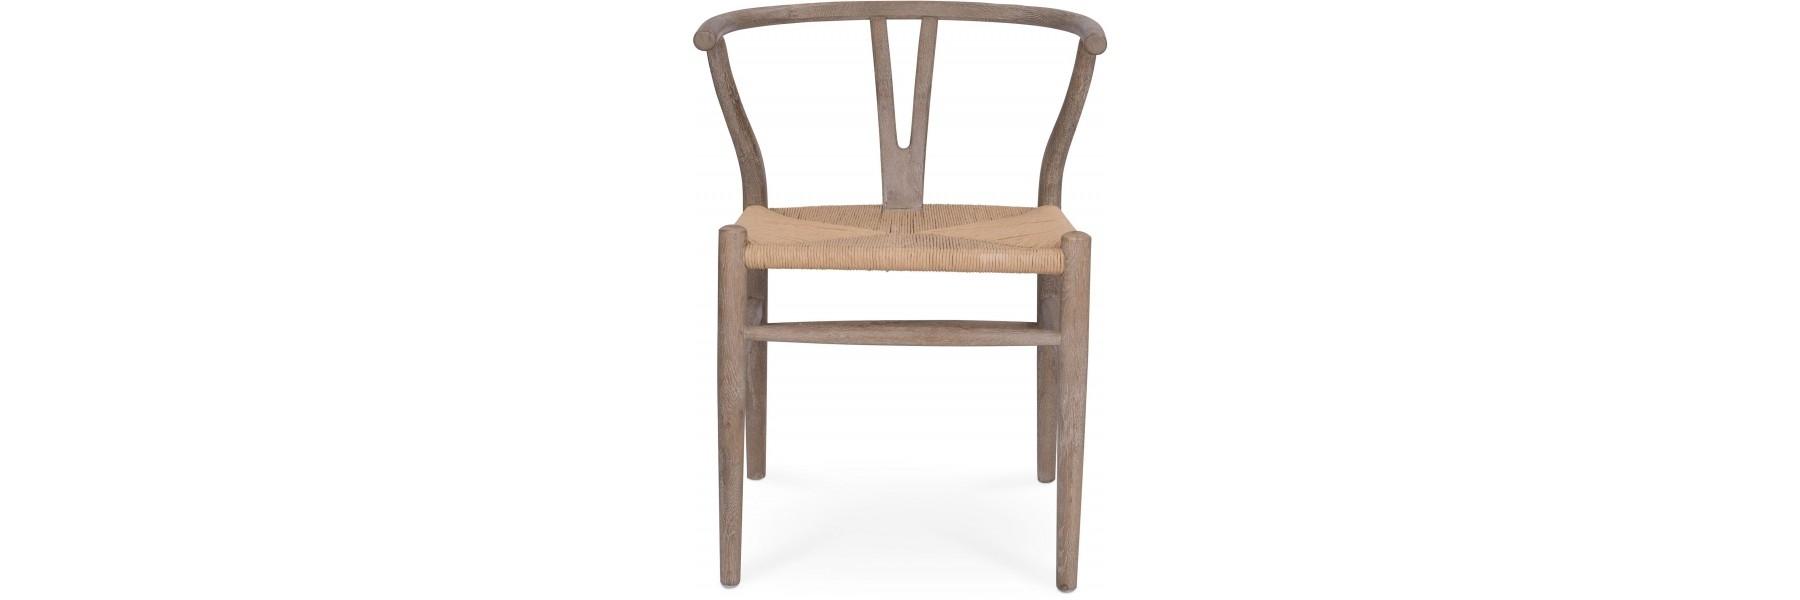 Light Burnt Oak Crane Dining Chair pertaining to Black Burnt Oak Sideboards (Image 13 of 30)